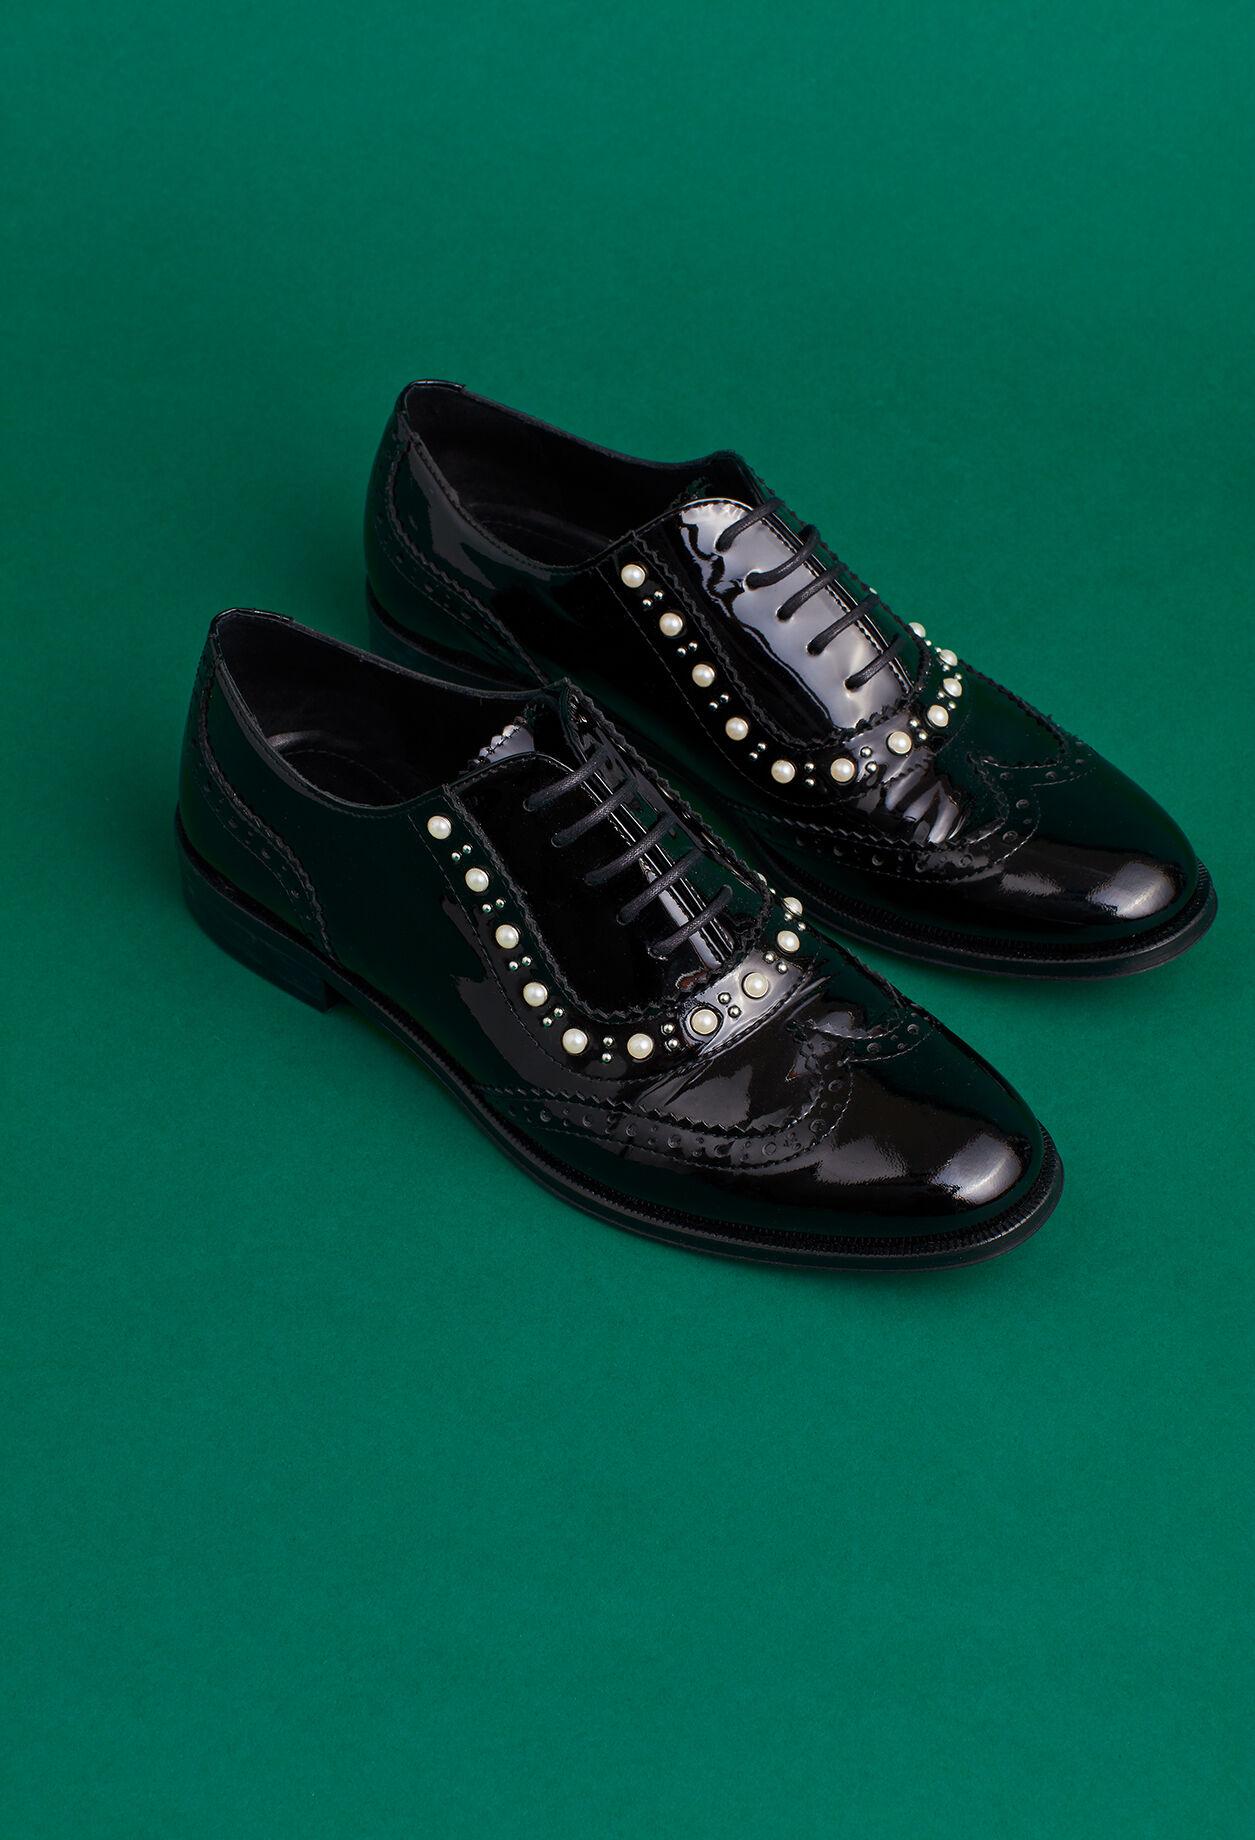 Pierlot Chaussures Ter Alexis Pierlot Claudie Alexis Chaussures Claudie Ter Ter Alexis wSv8WFUqRR